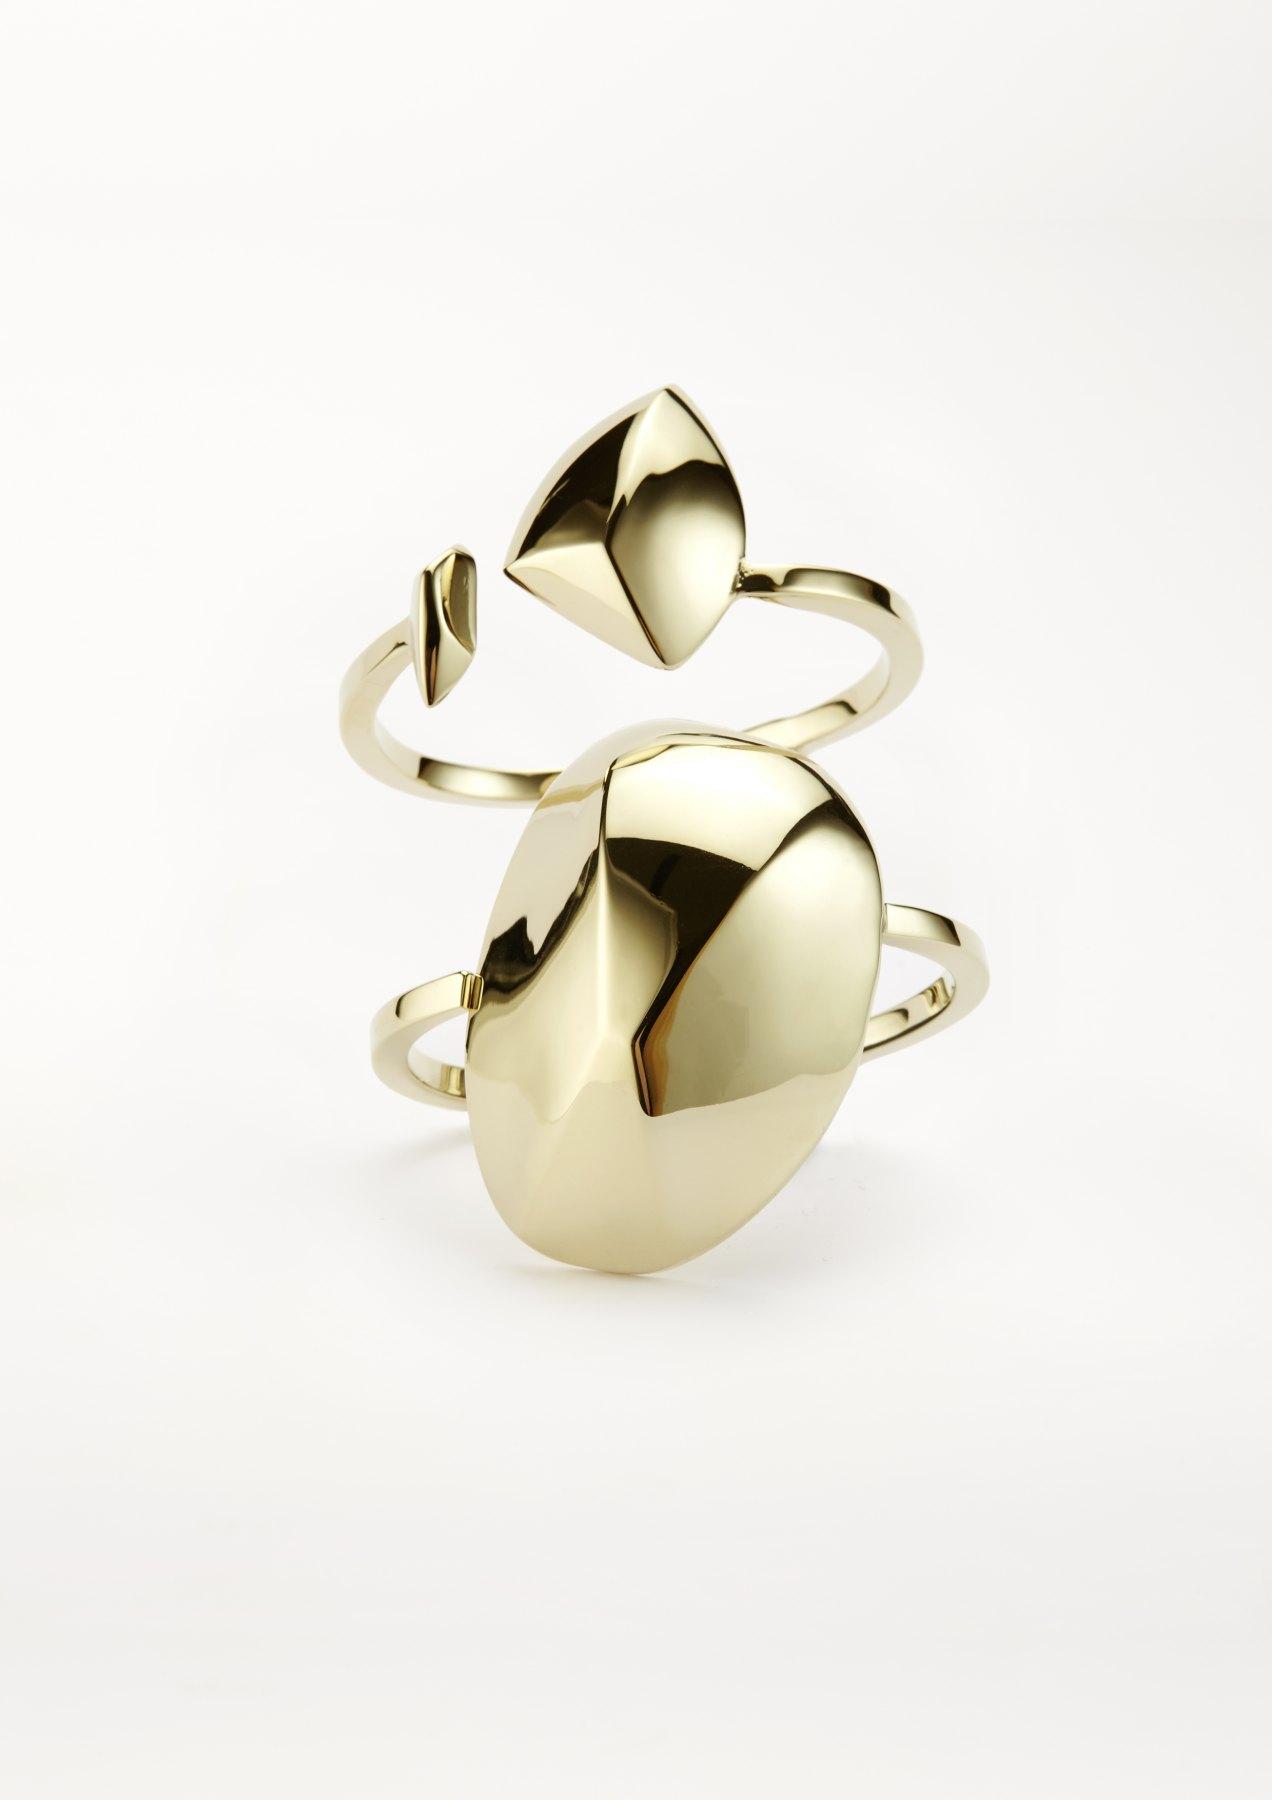 xenia bous schmuck Dancing Stone 10 Armband gold silber